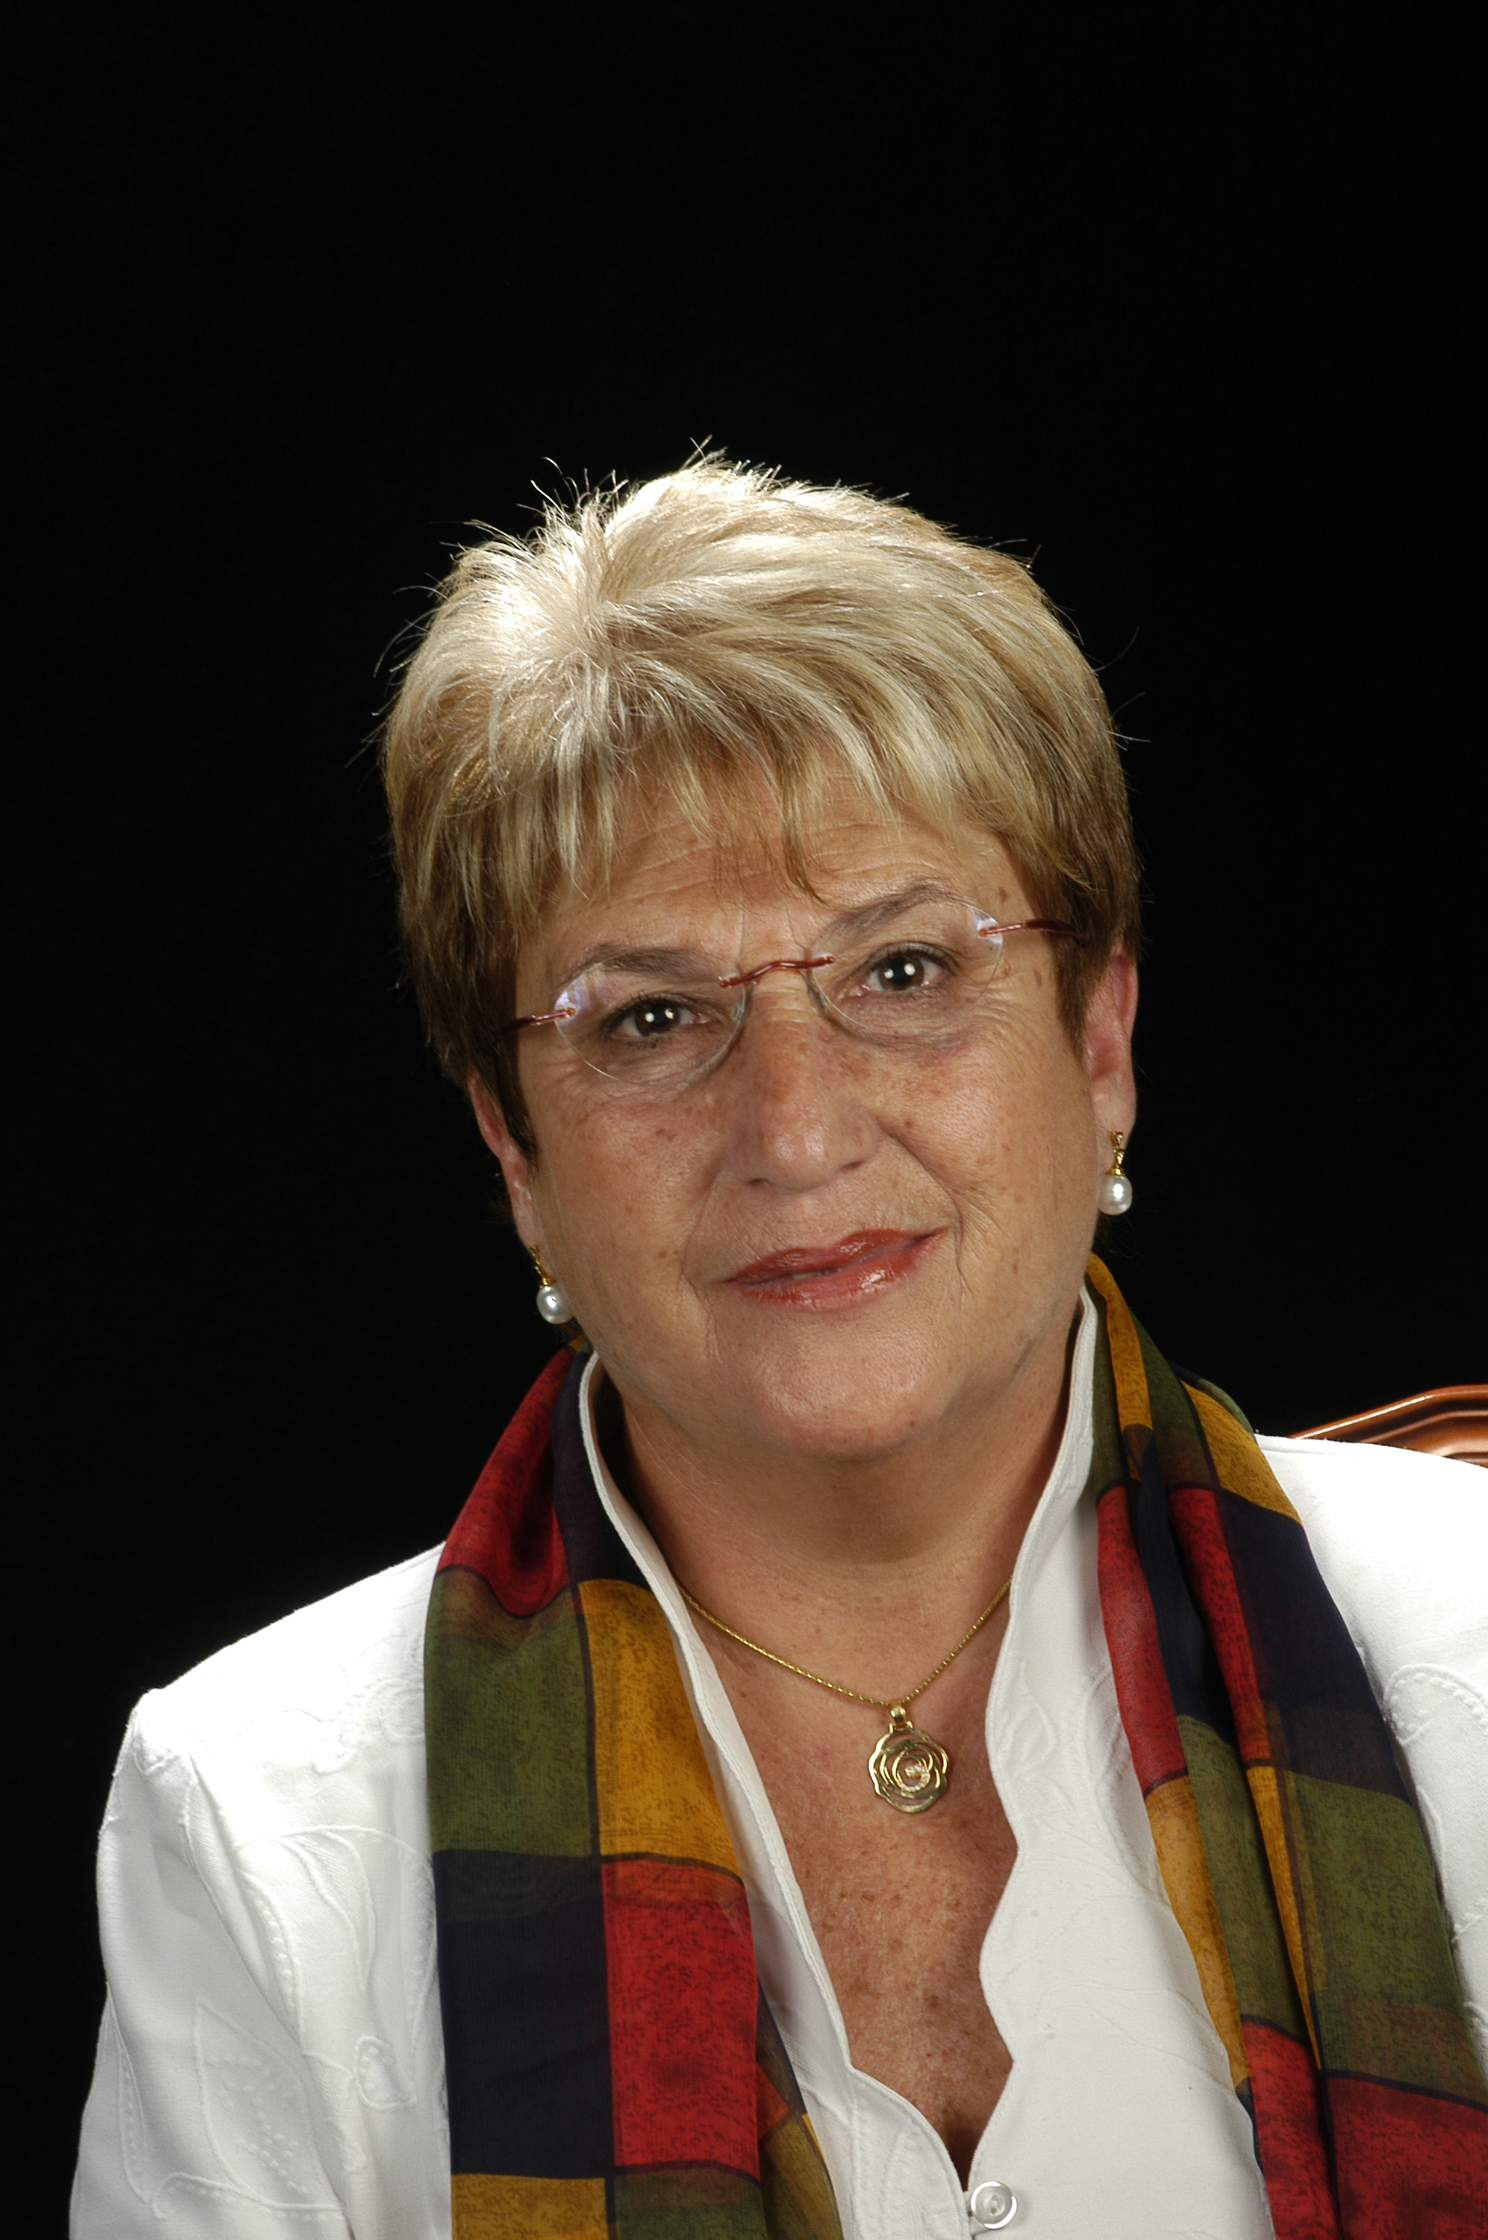 Dra. Maria Carceller Cendra